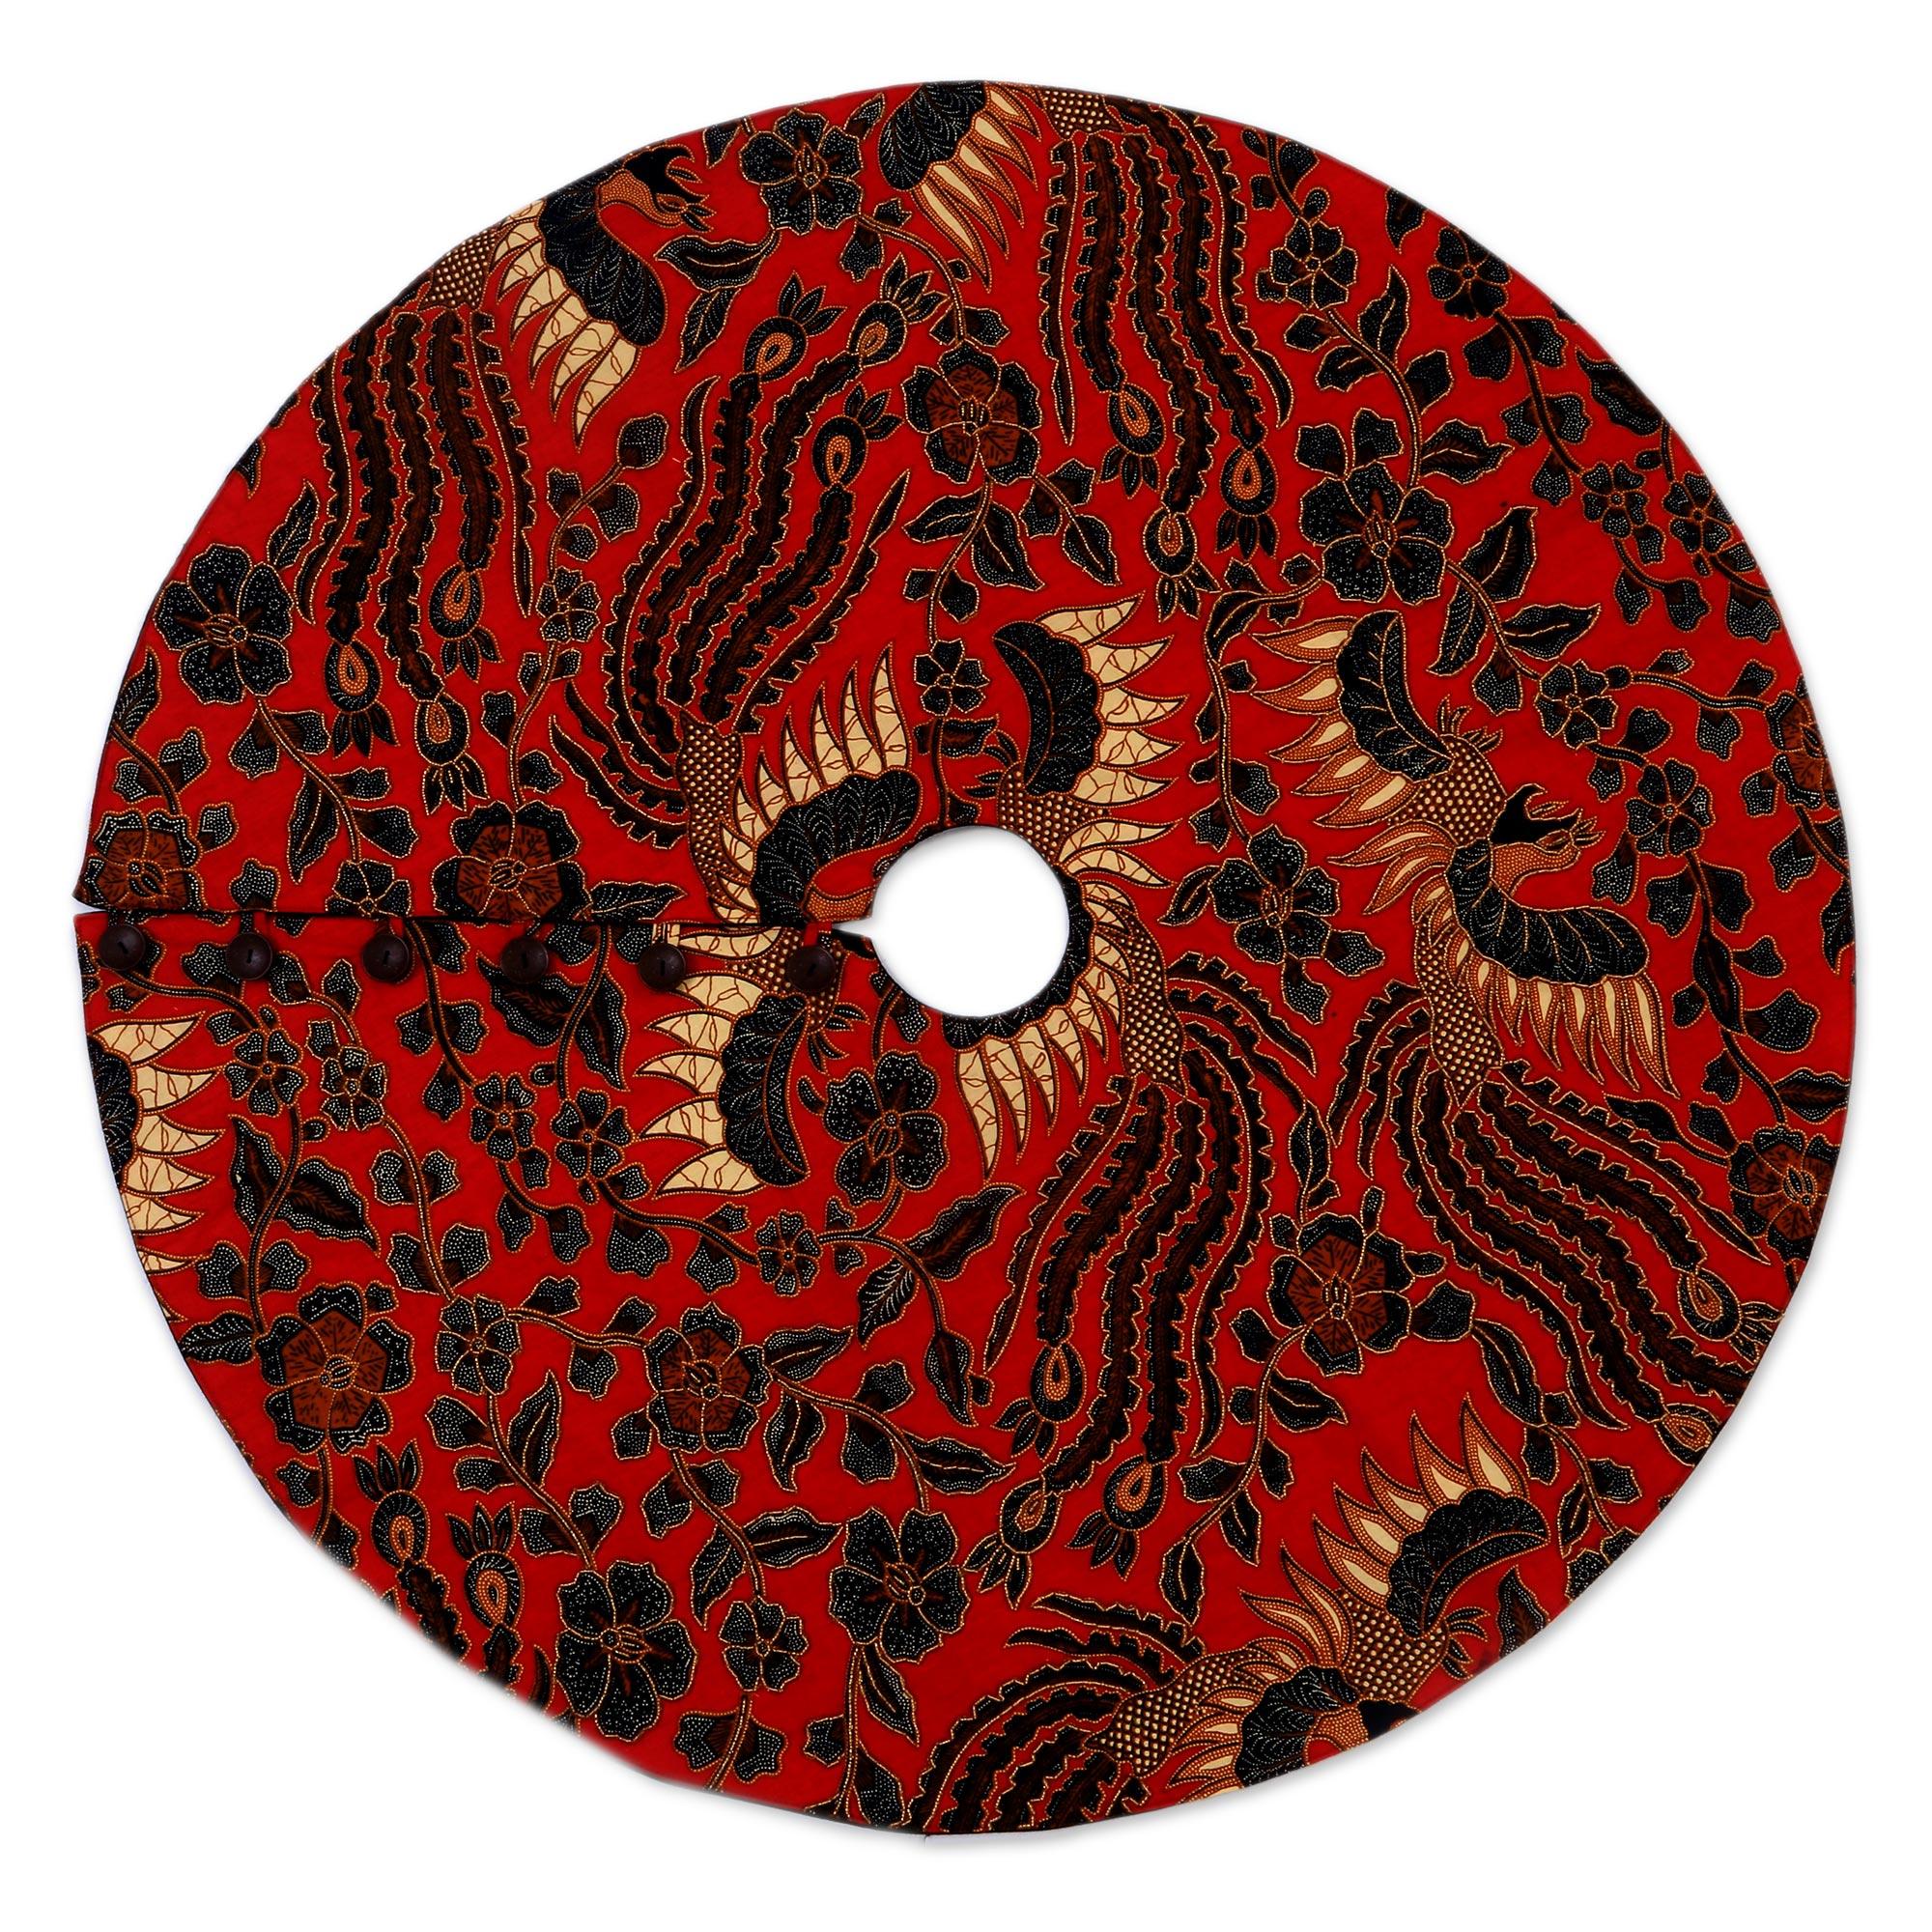 Batik Handmade Red Black And Gold Tree Skirt From Java Batik Christmas